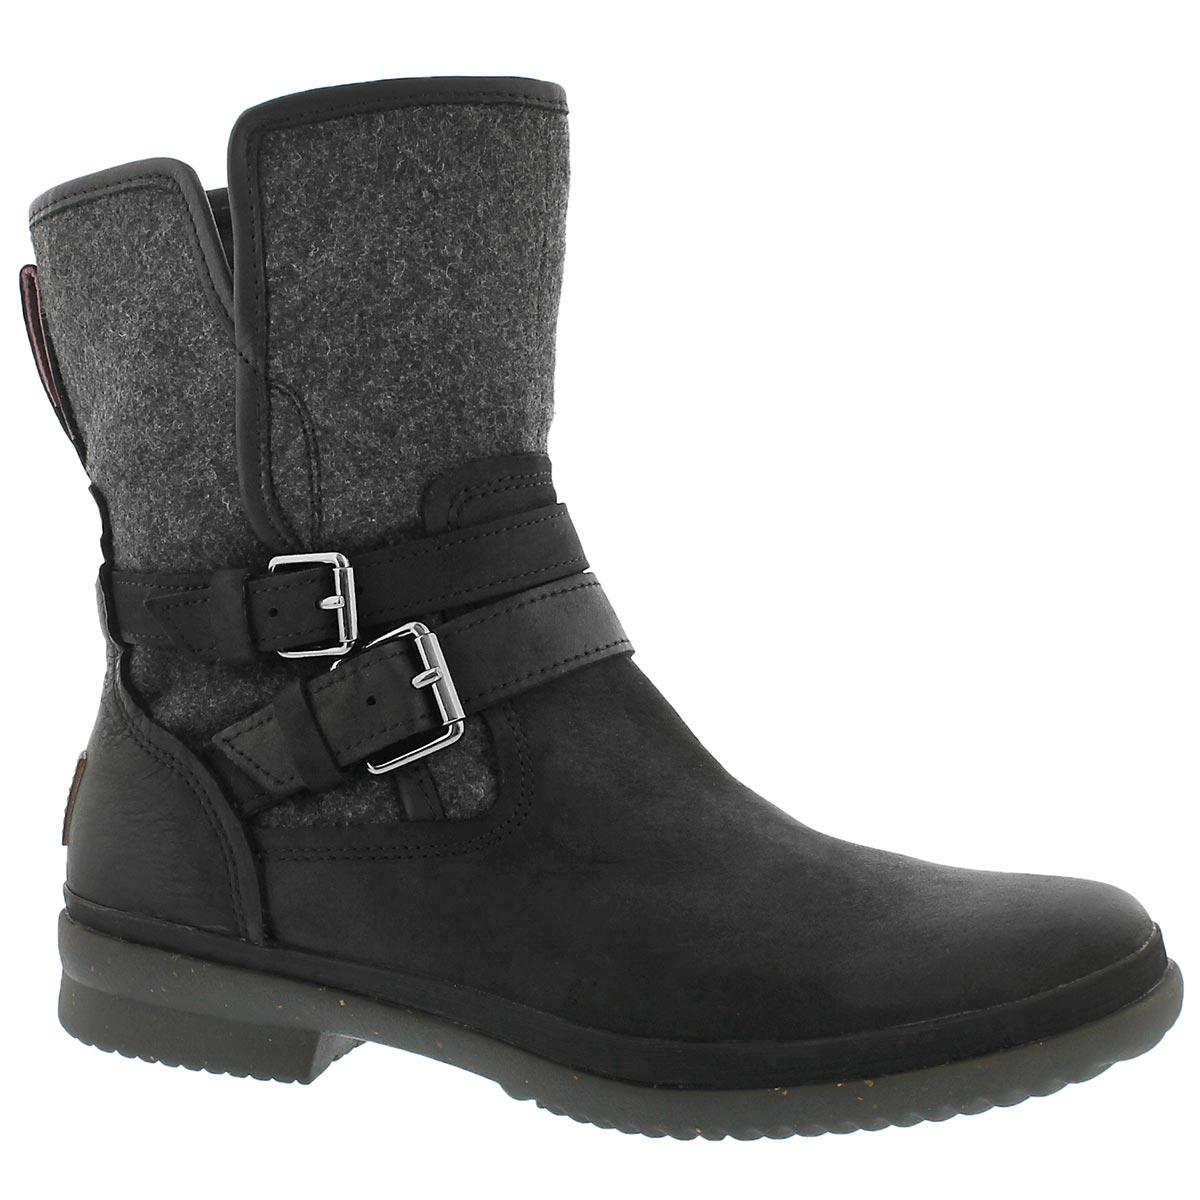 Women's SIMMENS black waterproof boots